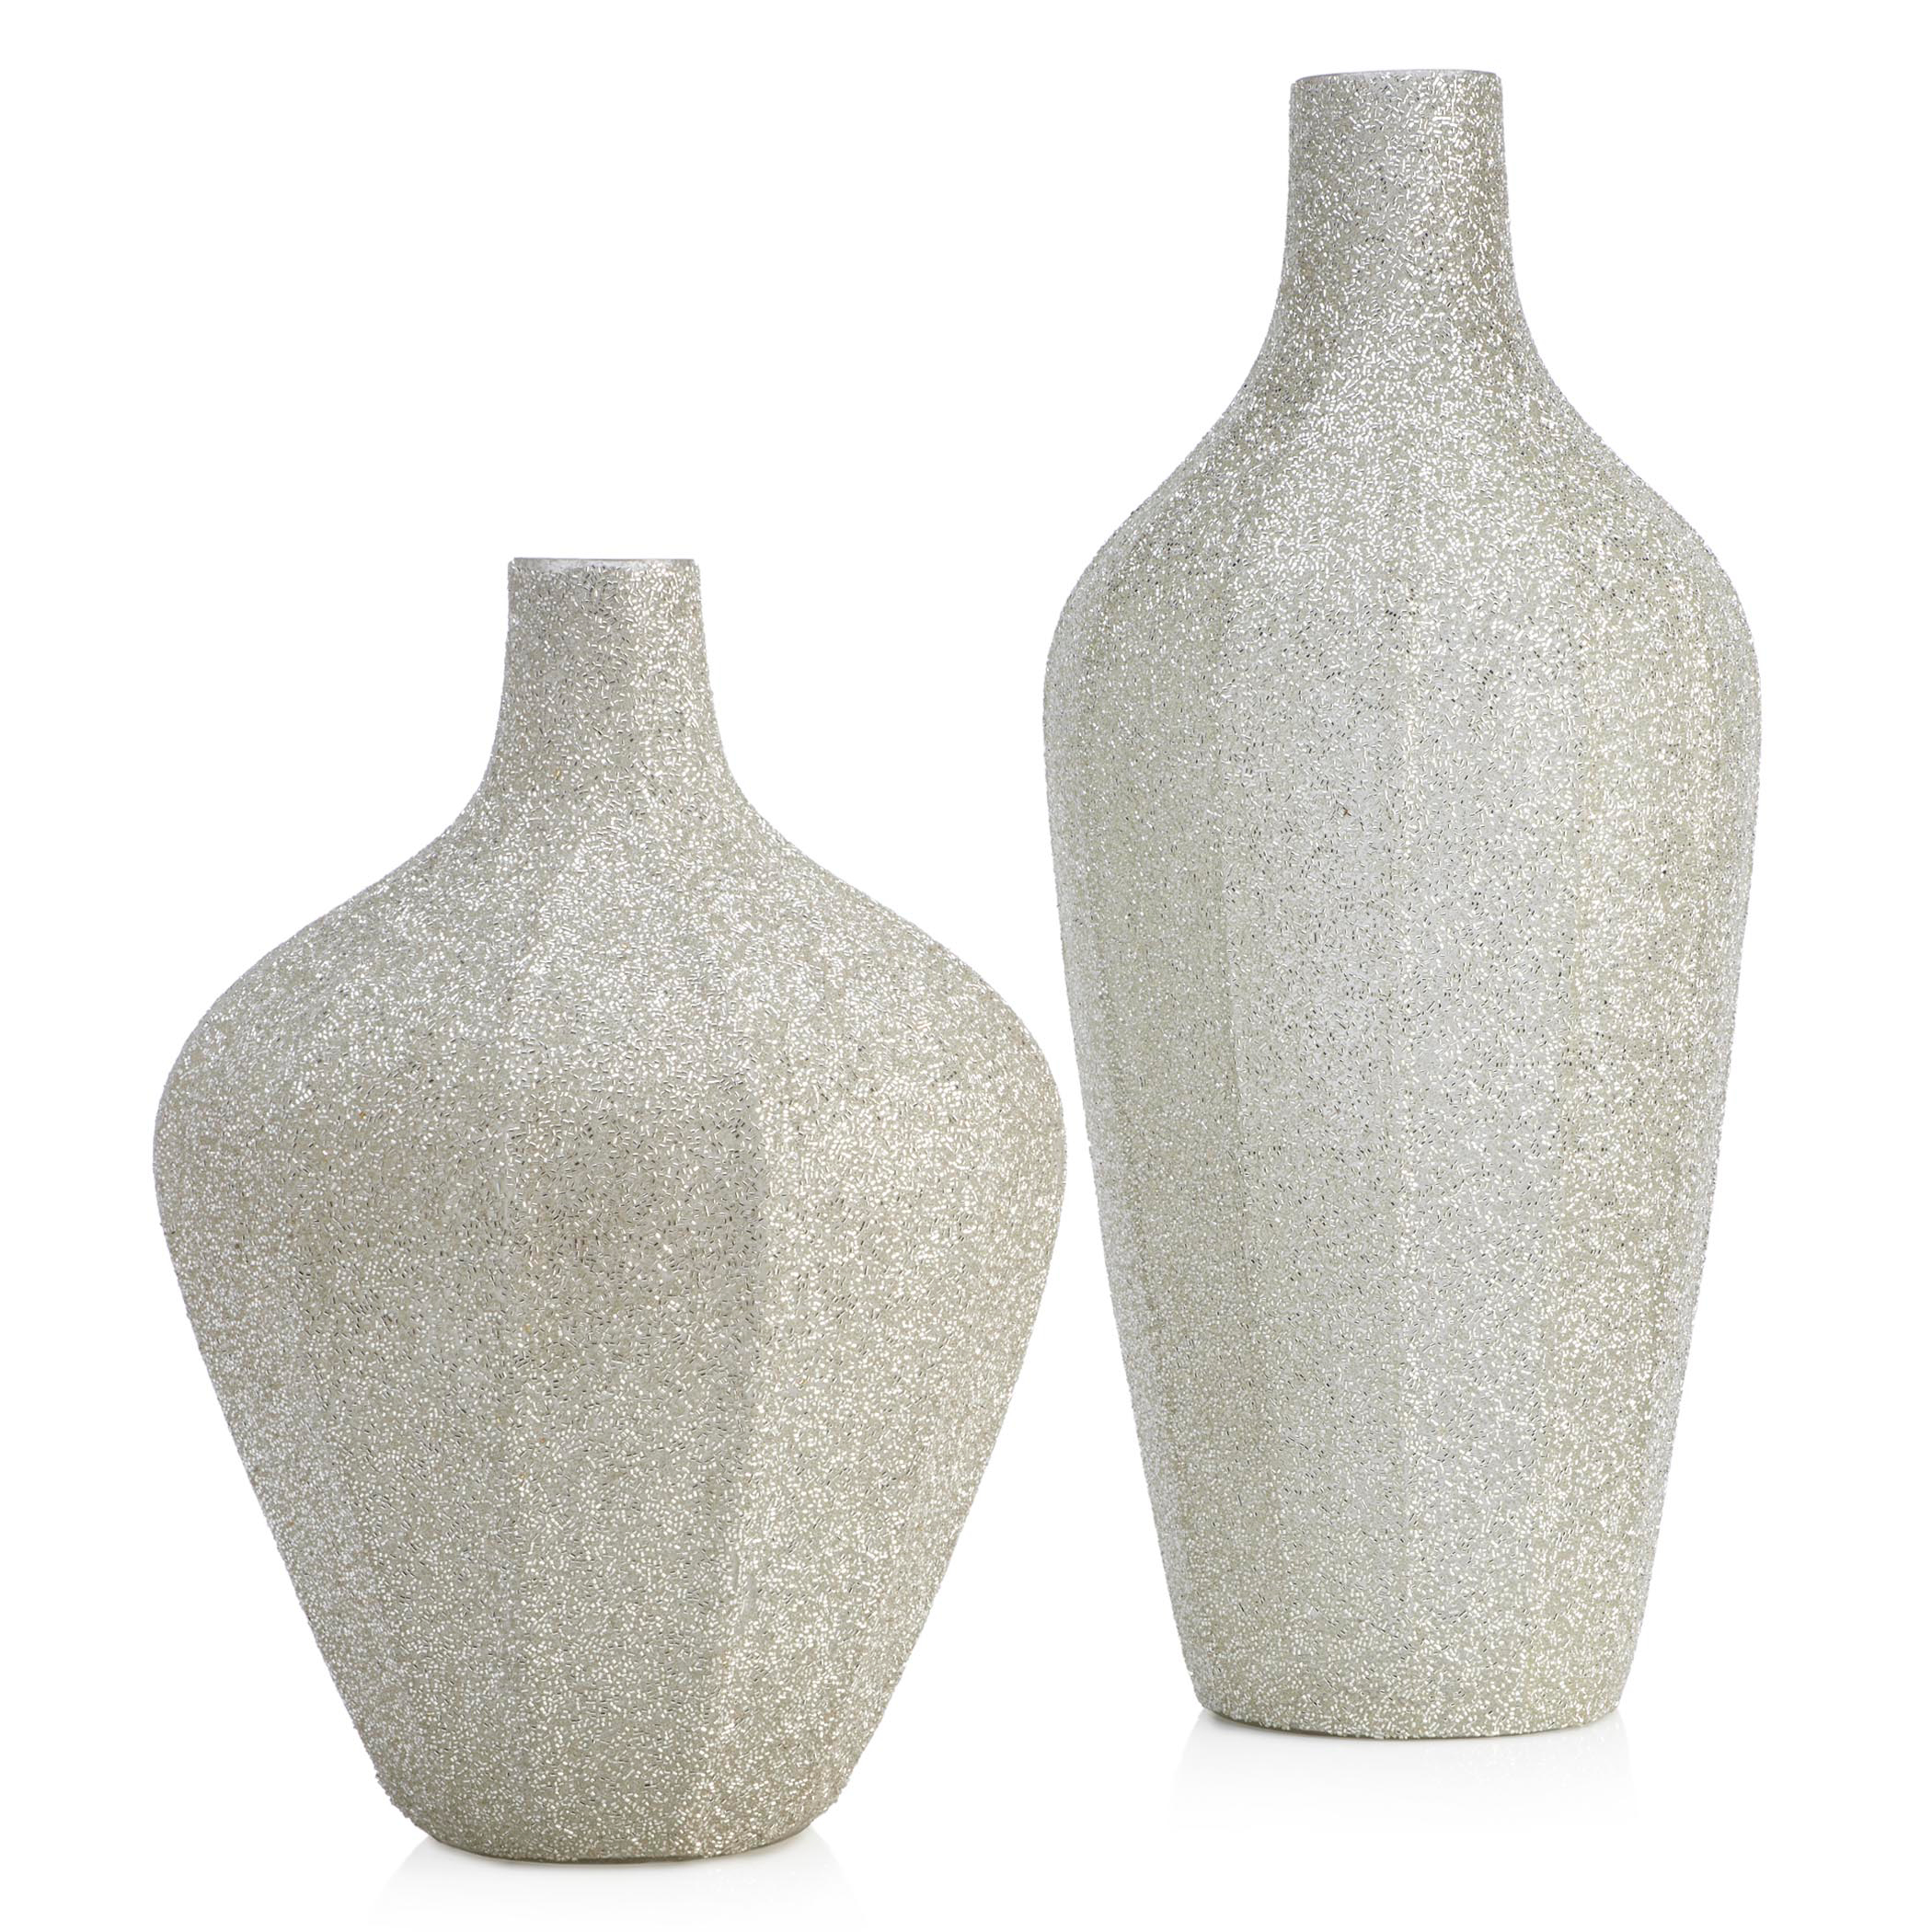 Bella Vase